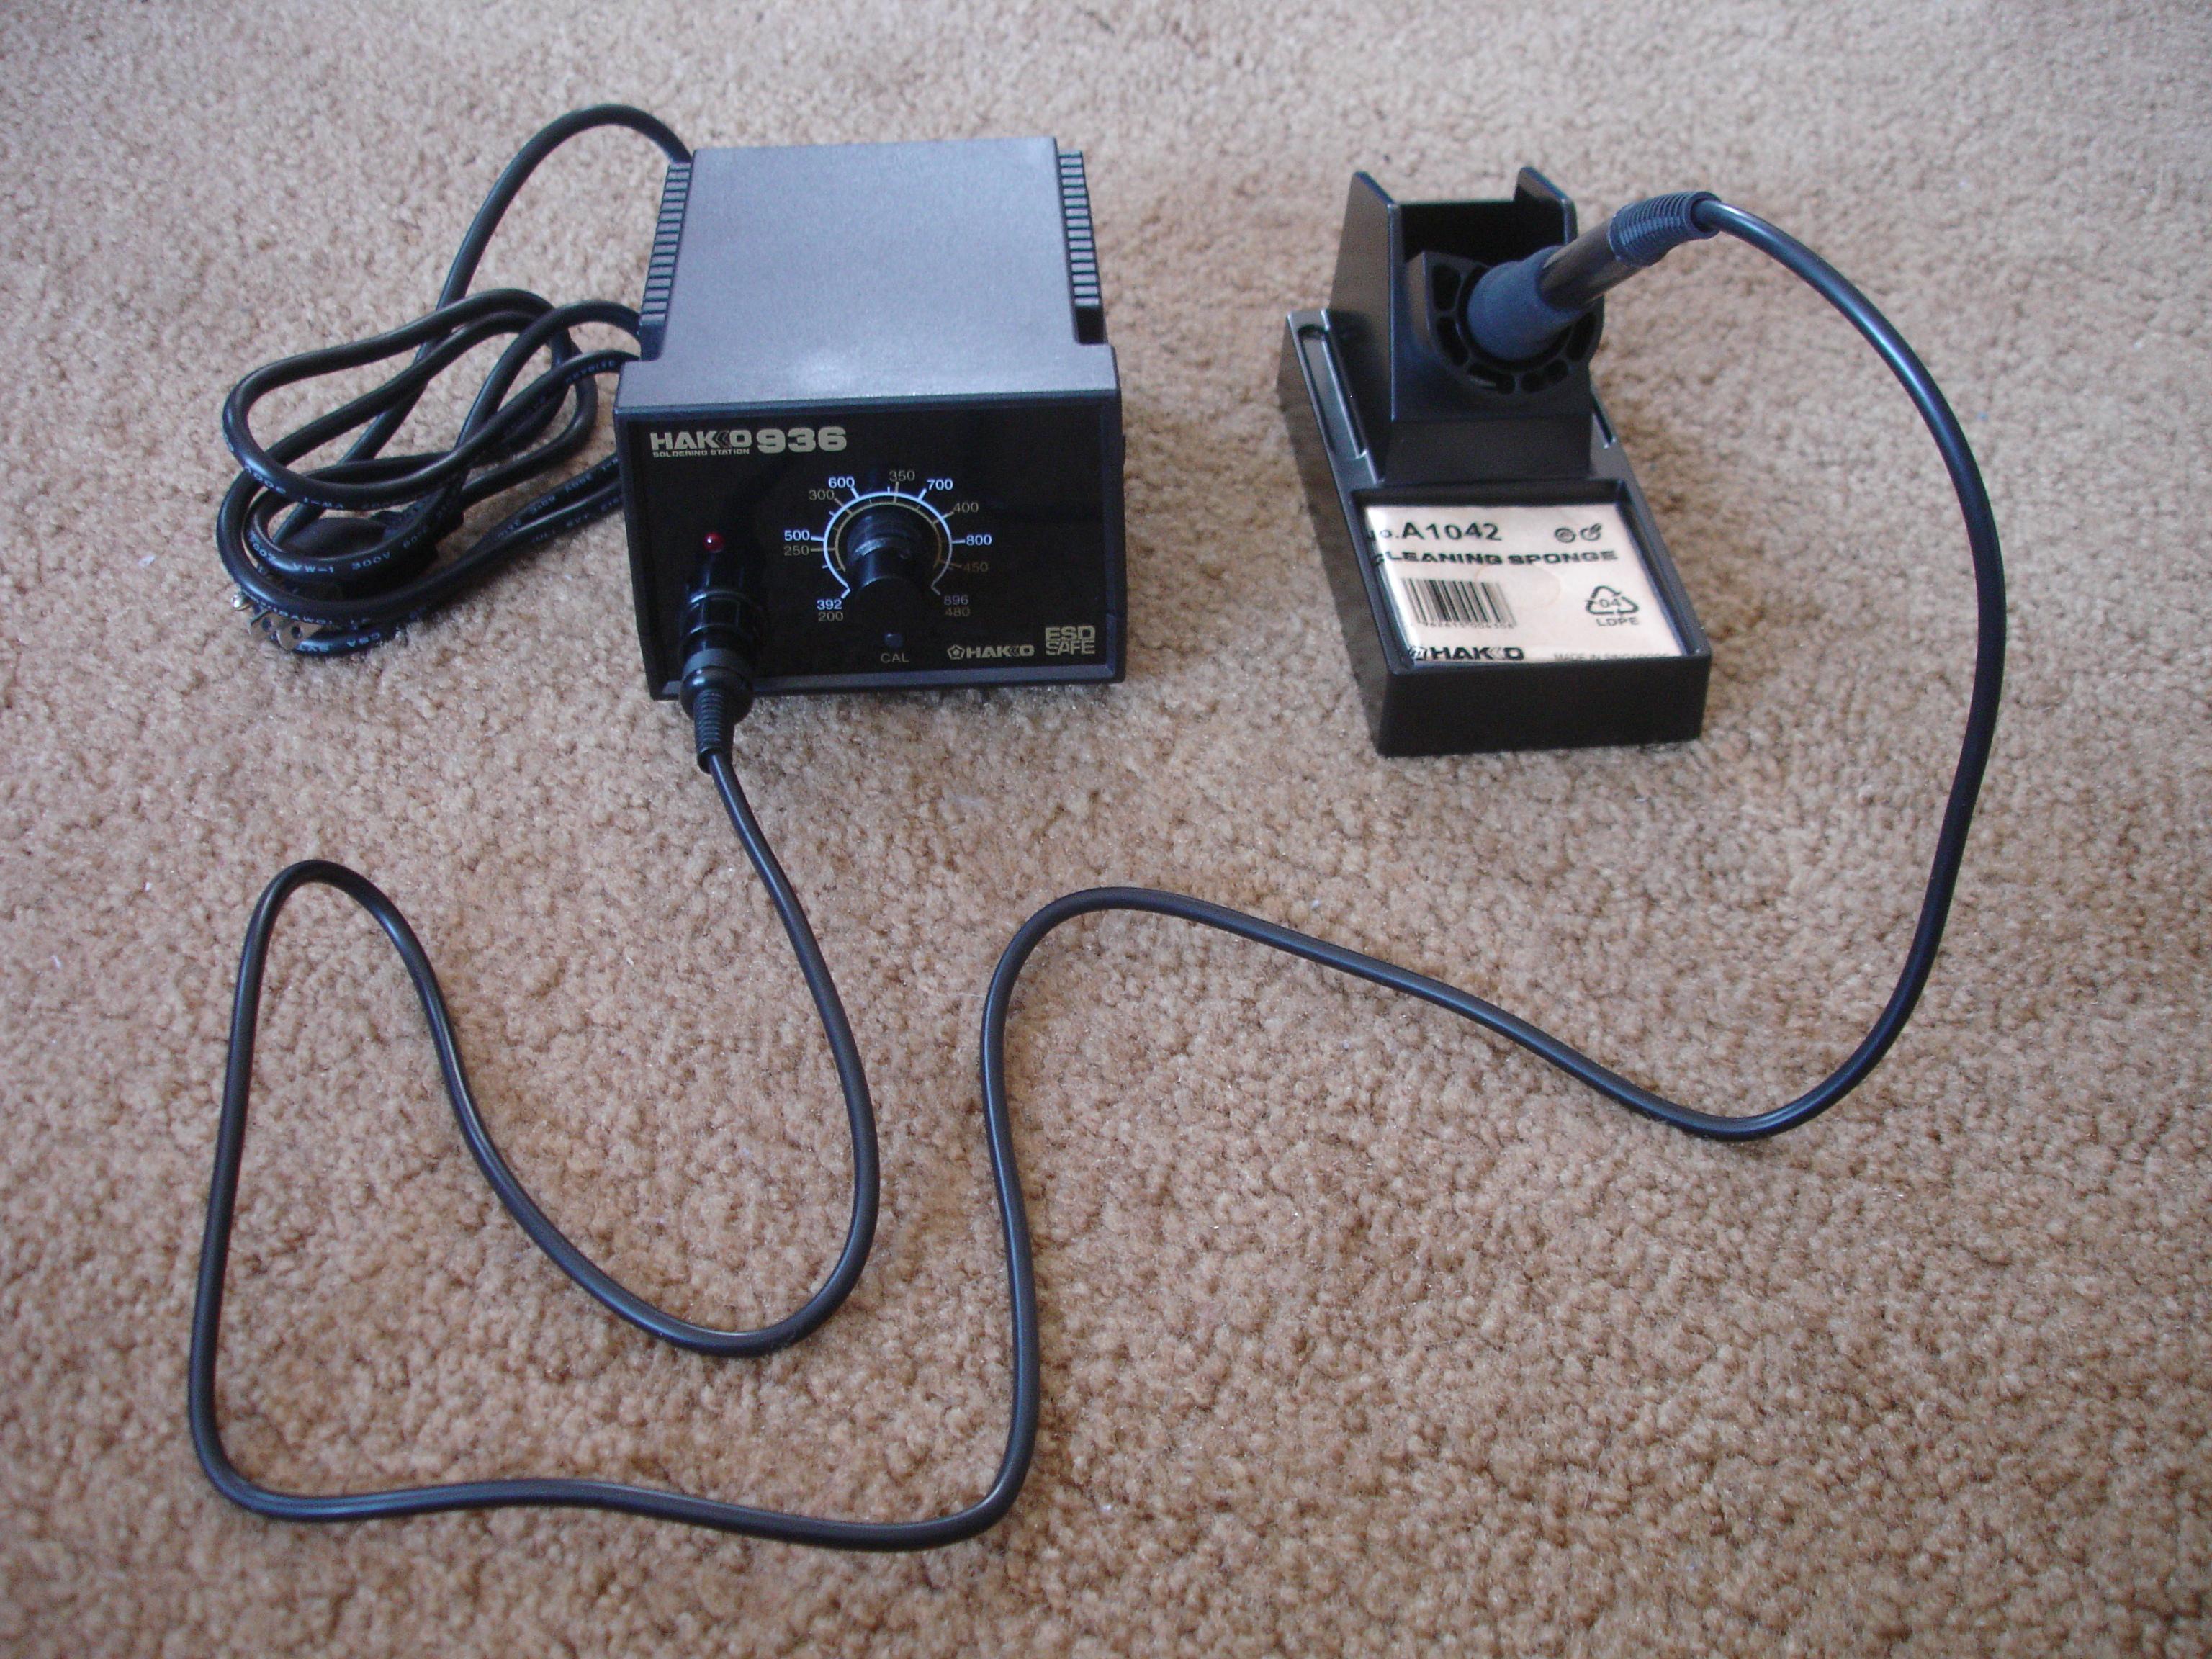 File:Hakko 936 soldering station complete.jpeg